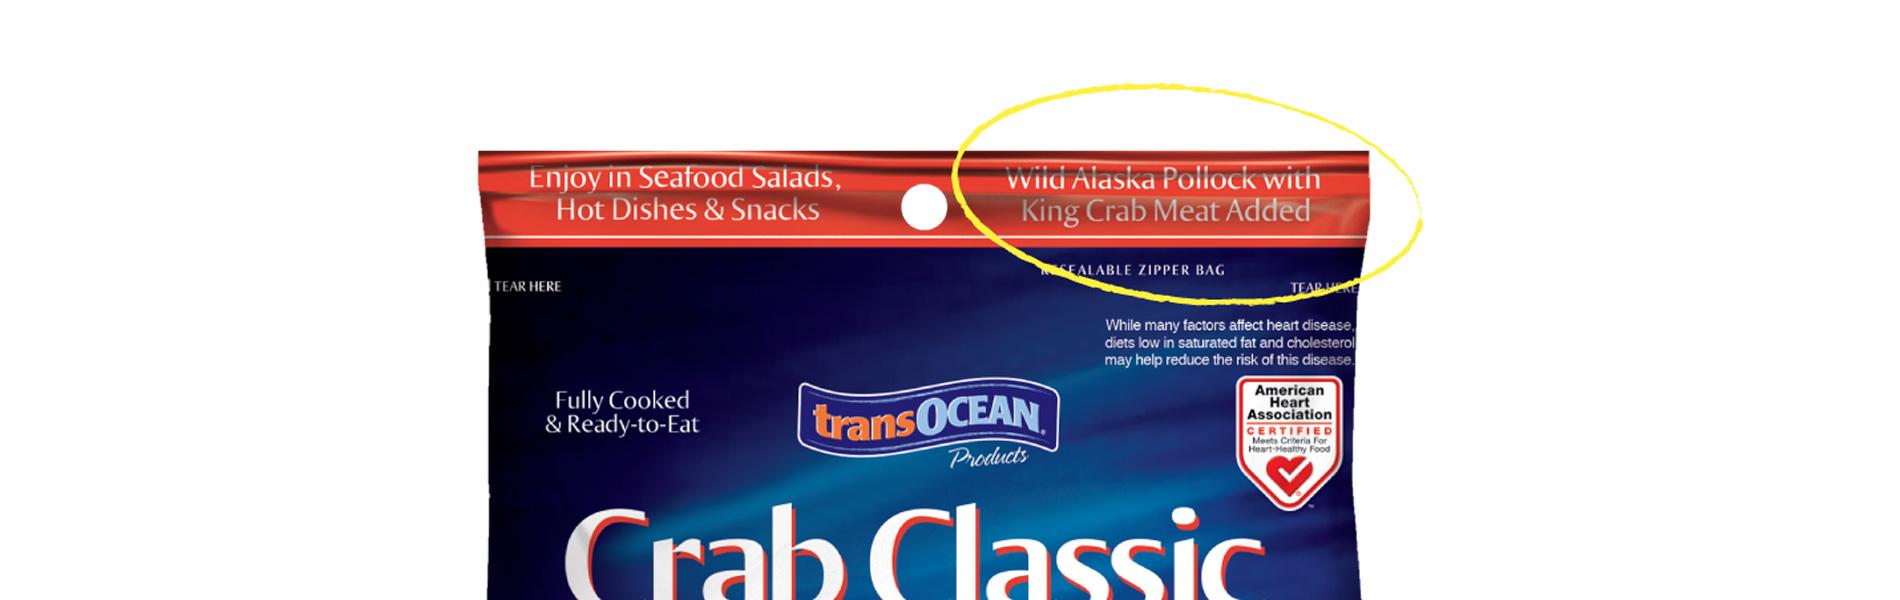 crab-classic-wild-alaska-pkg